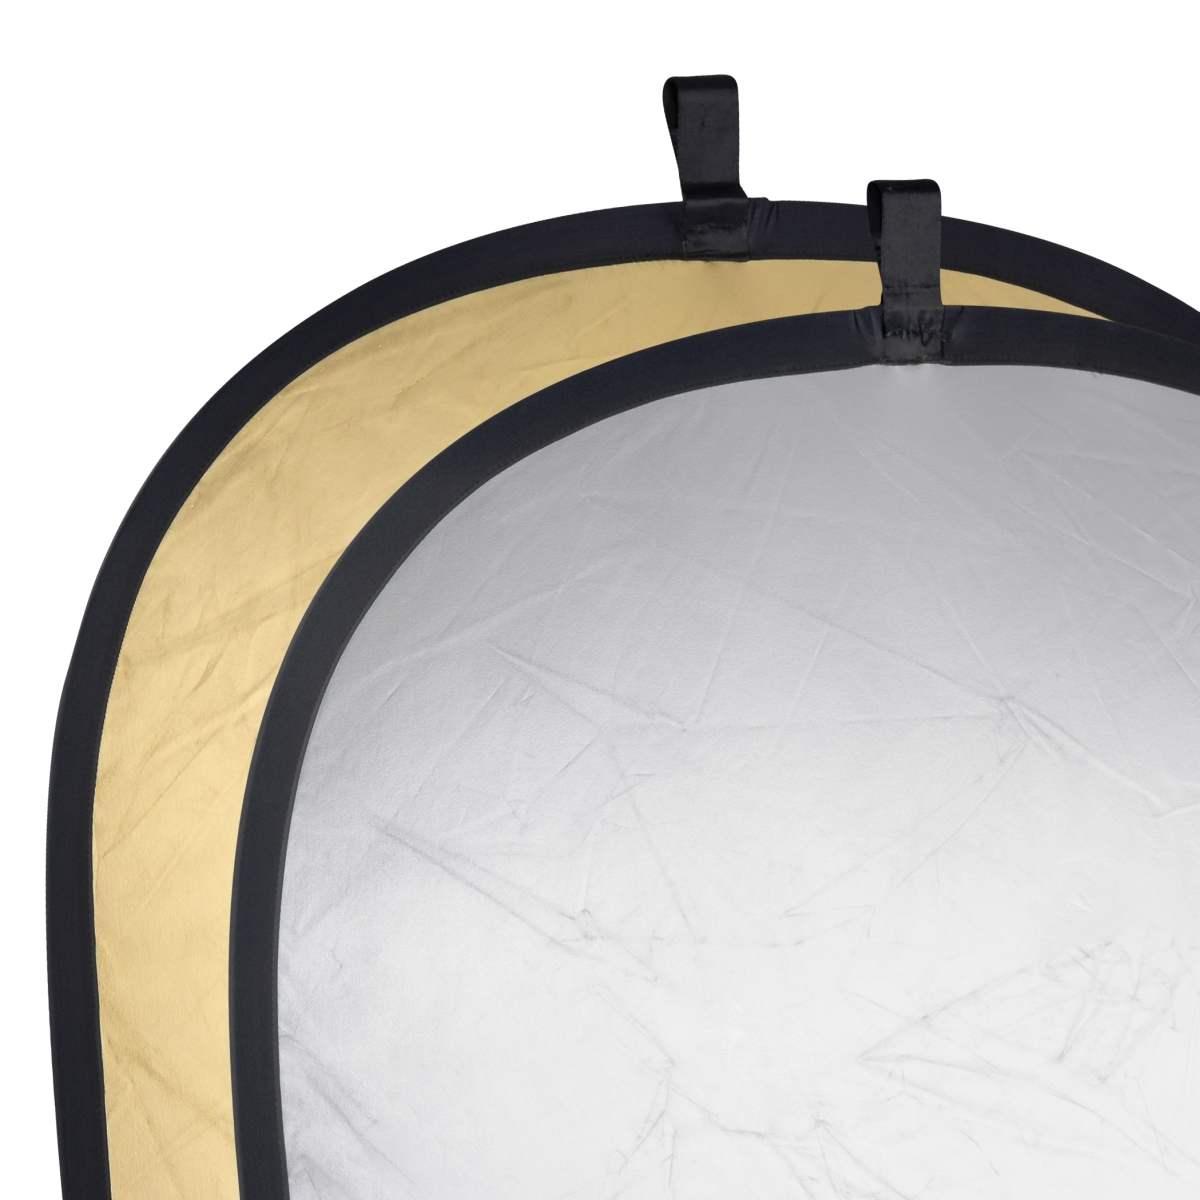 Foldable Reflector golden/silver, 102x168cm